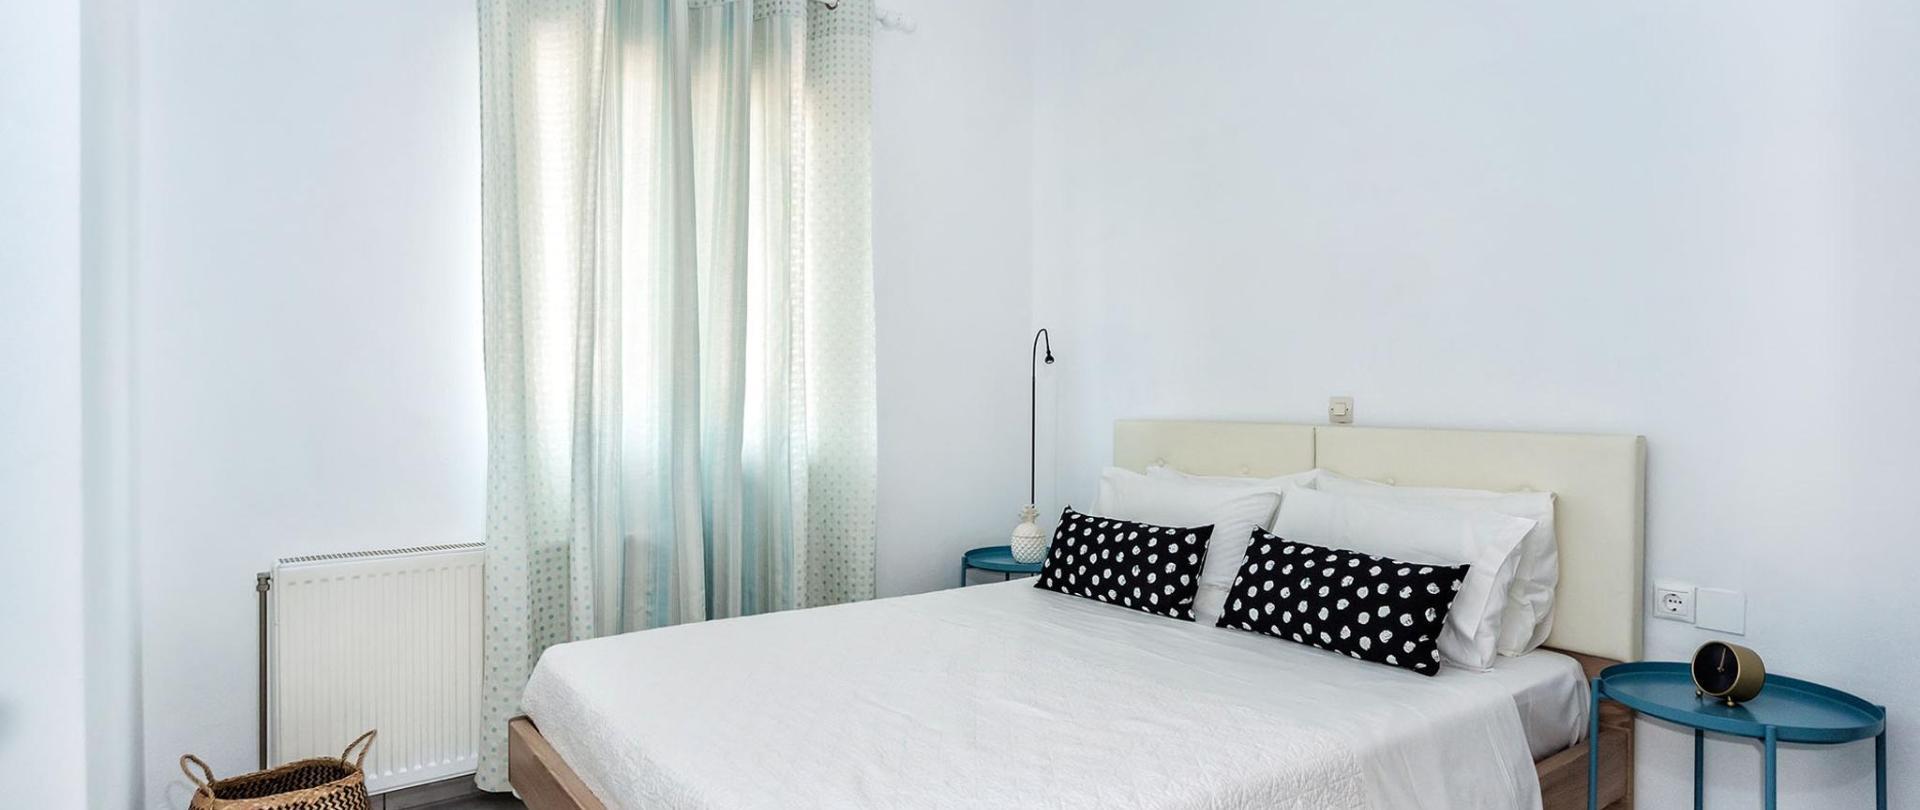 Room_3  (1).jpg